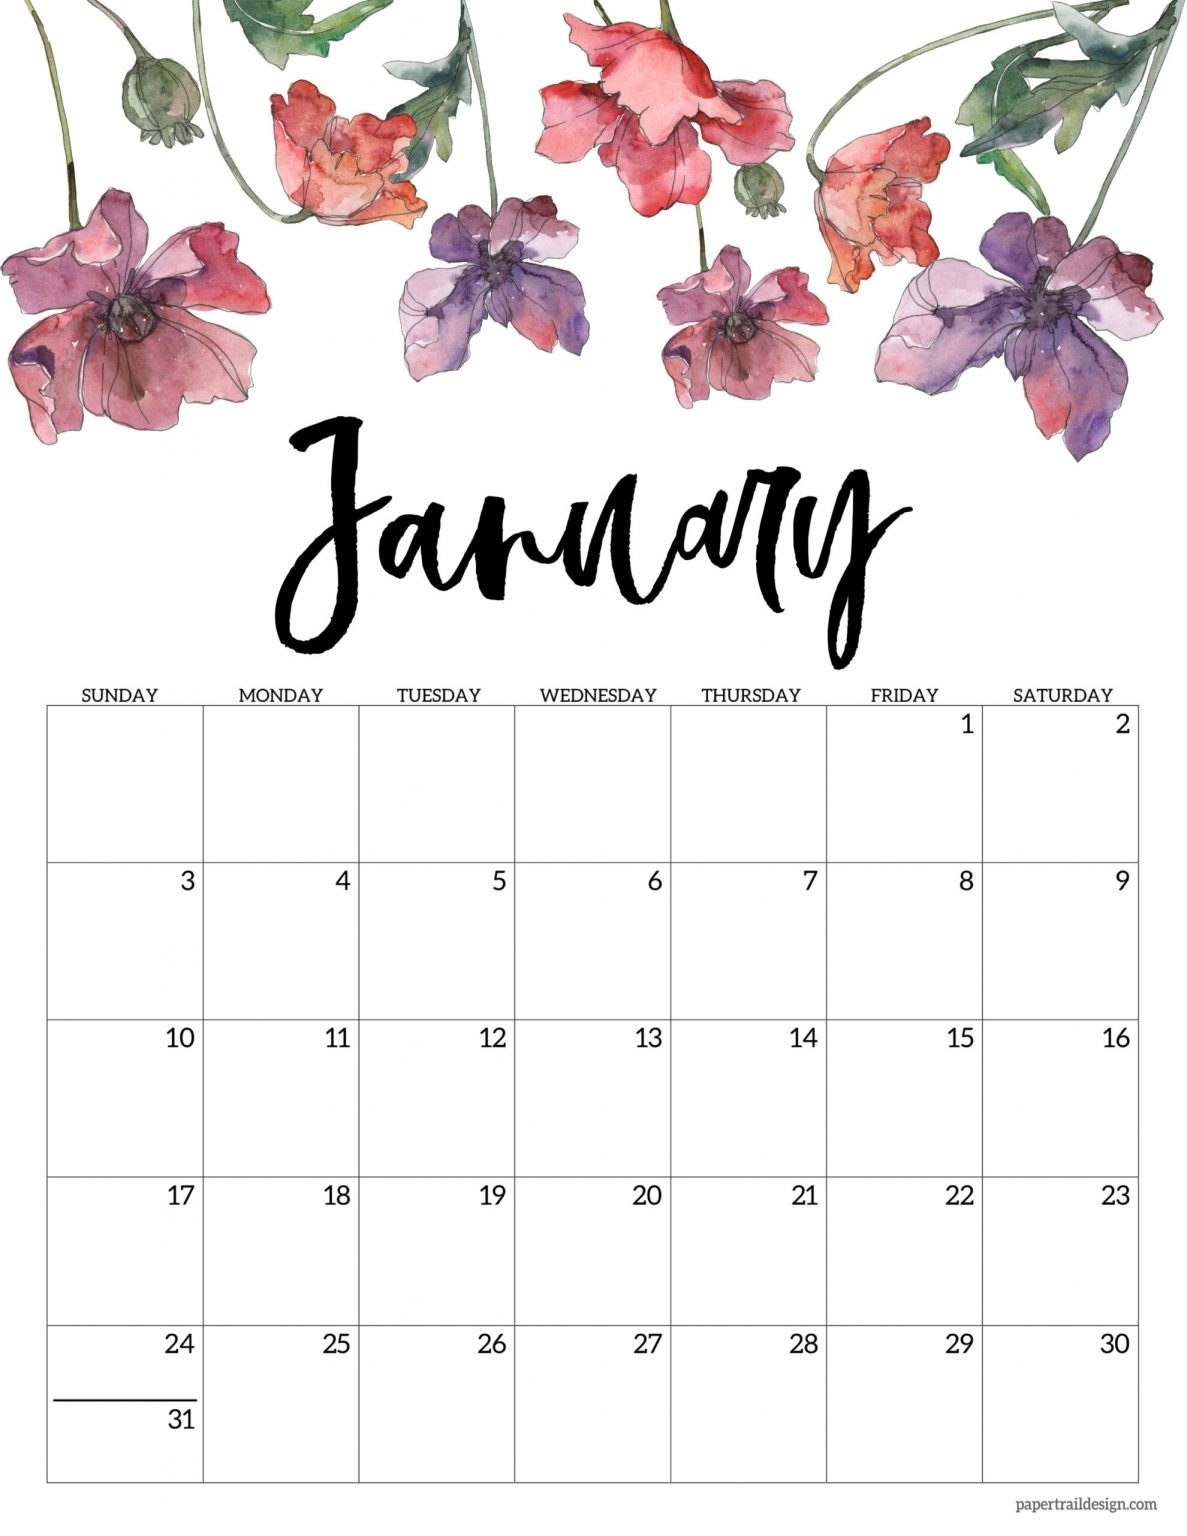 2021 Free Printable Calendar Floral Paper Trail Design - Calendar Template 2021 August 2021 Calendar Floral